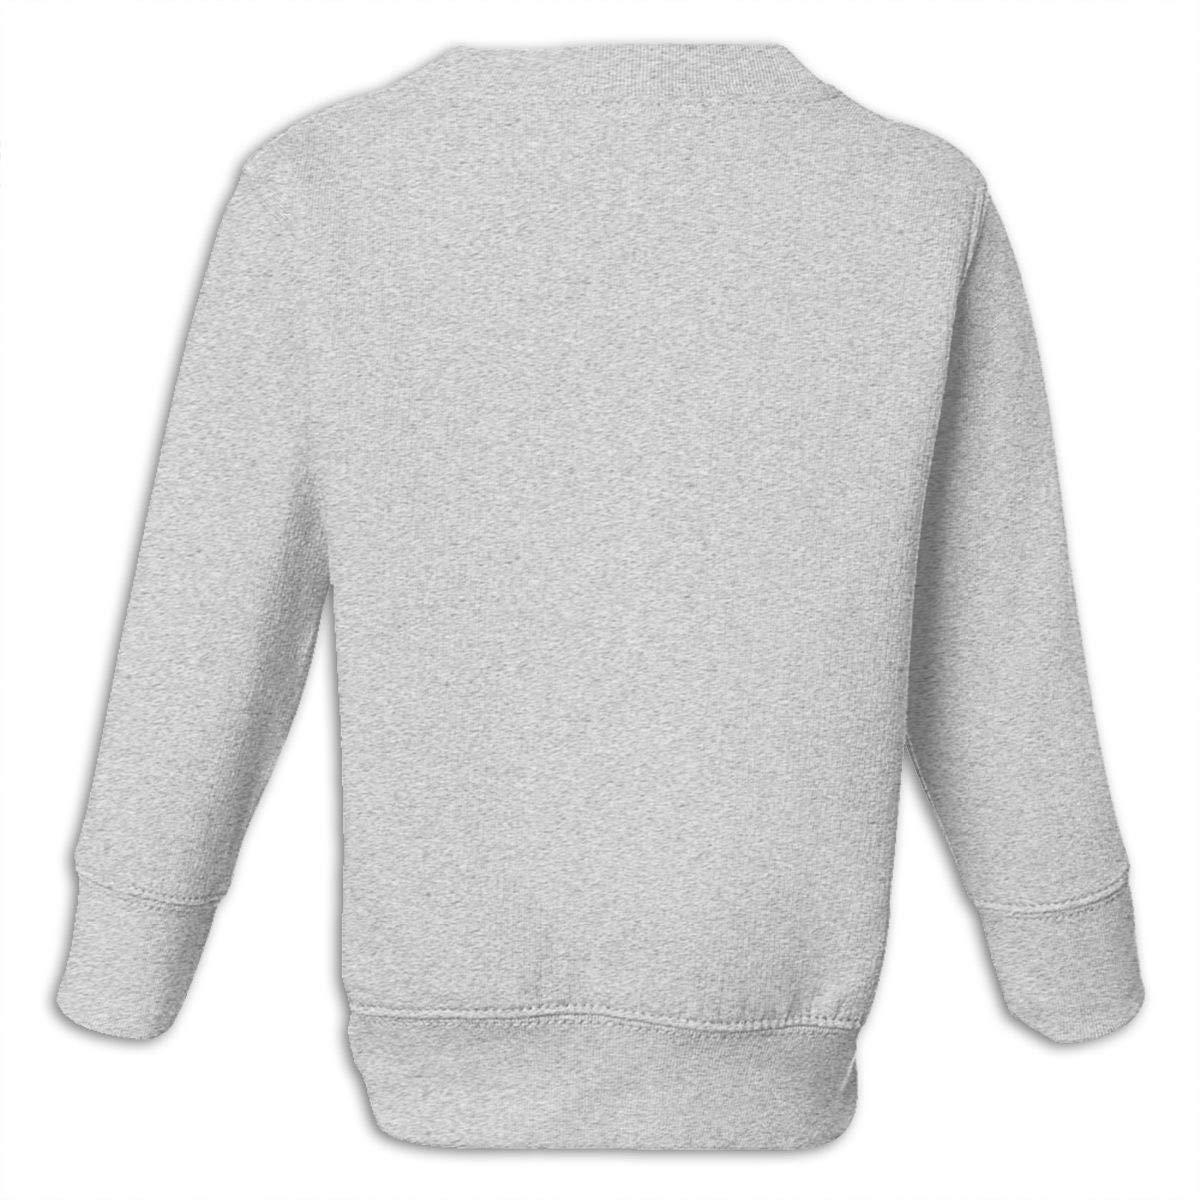 NMDJC CCQ My Daddy Digs Me Baby Sweatshirt Adorable Kids Hoodies Comfortable Pullovers